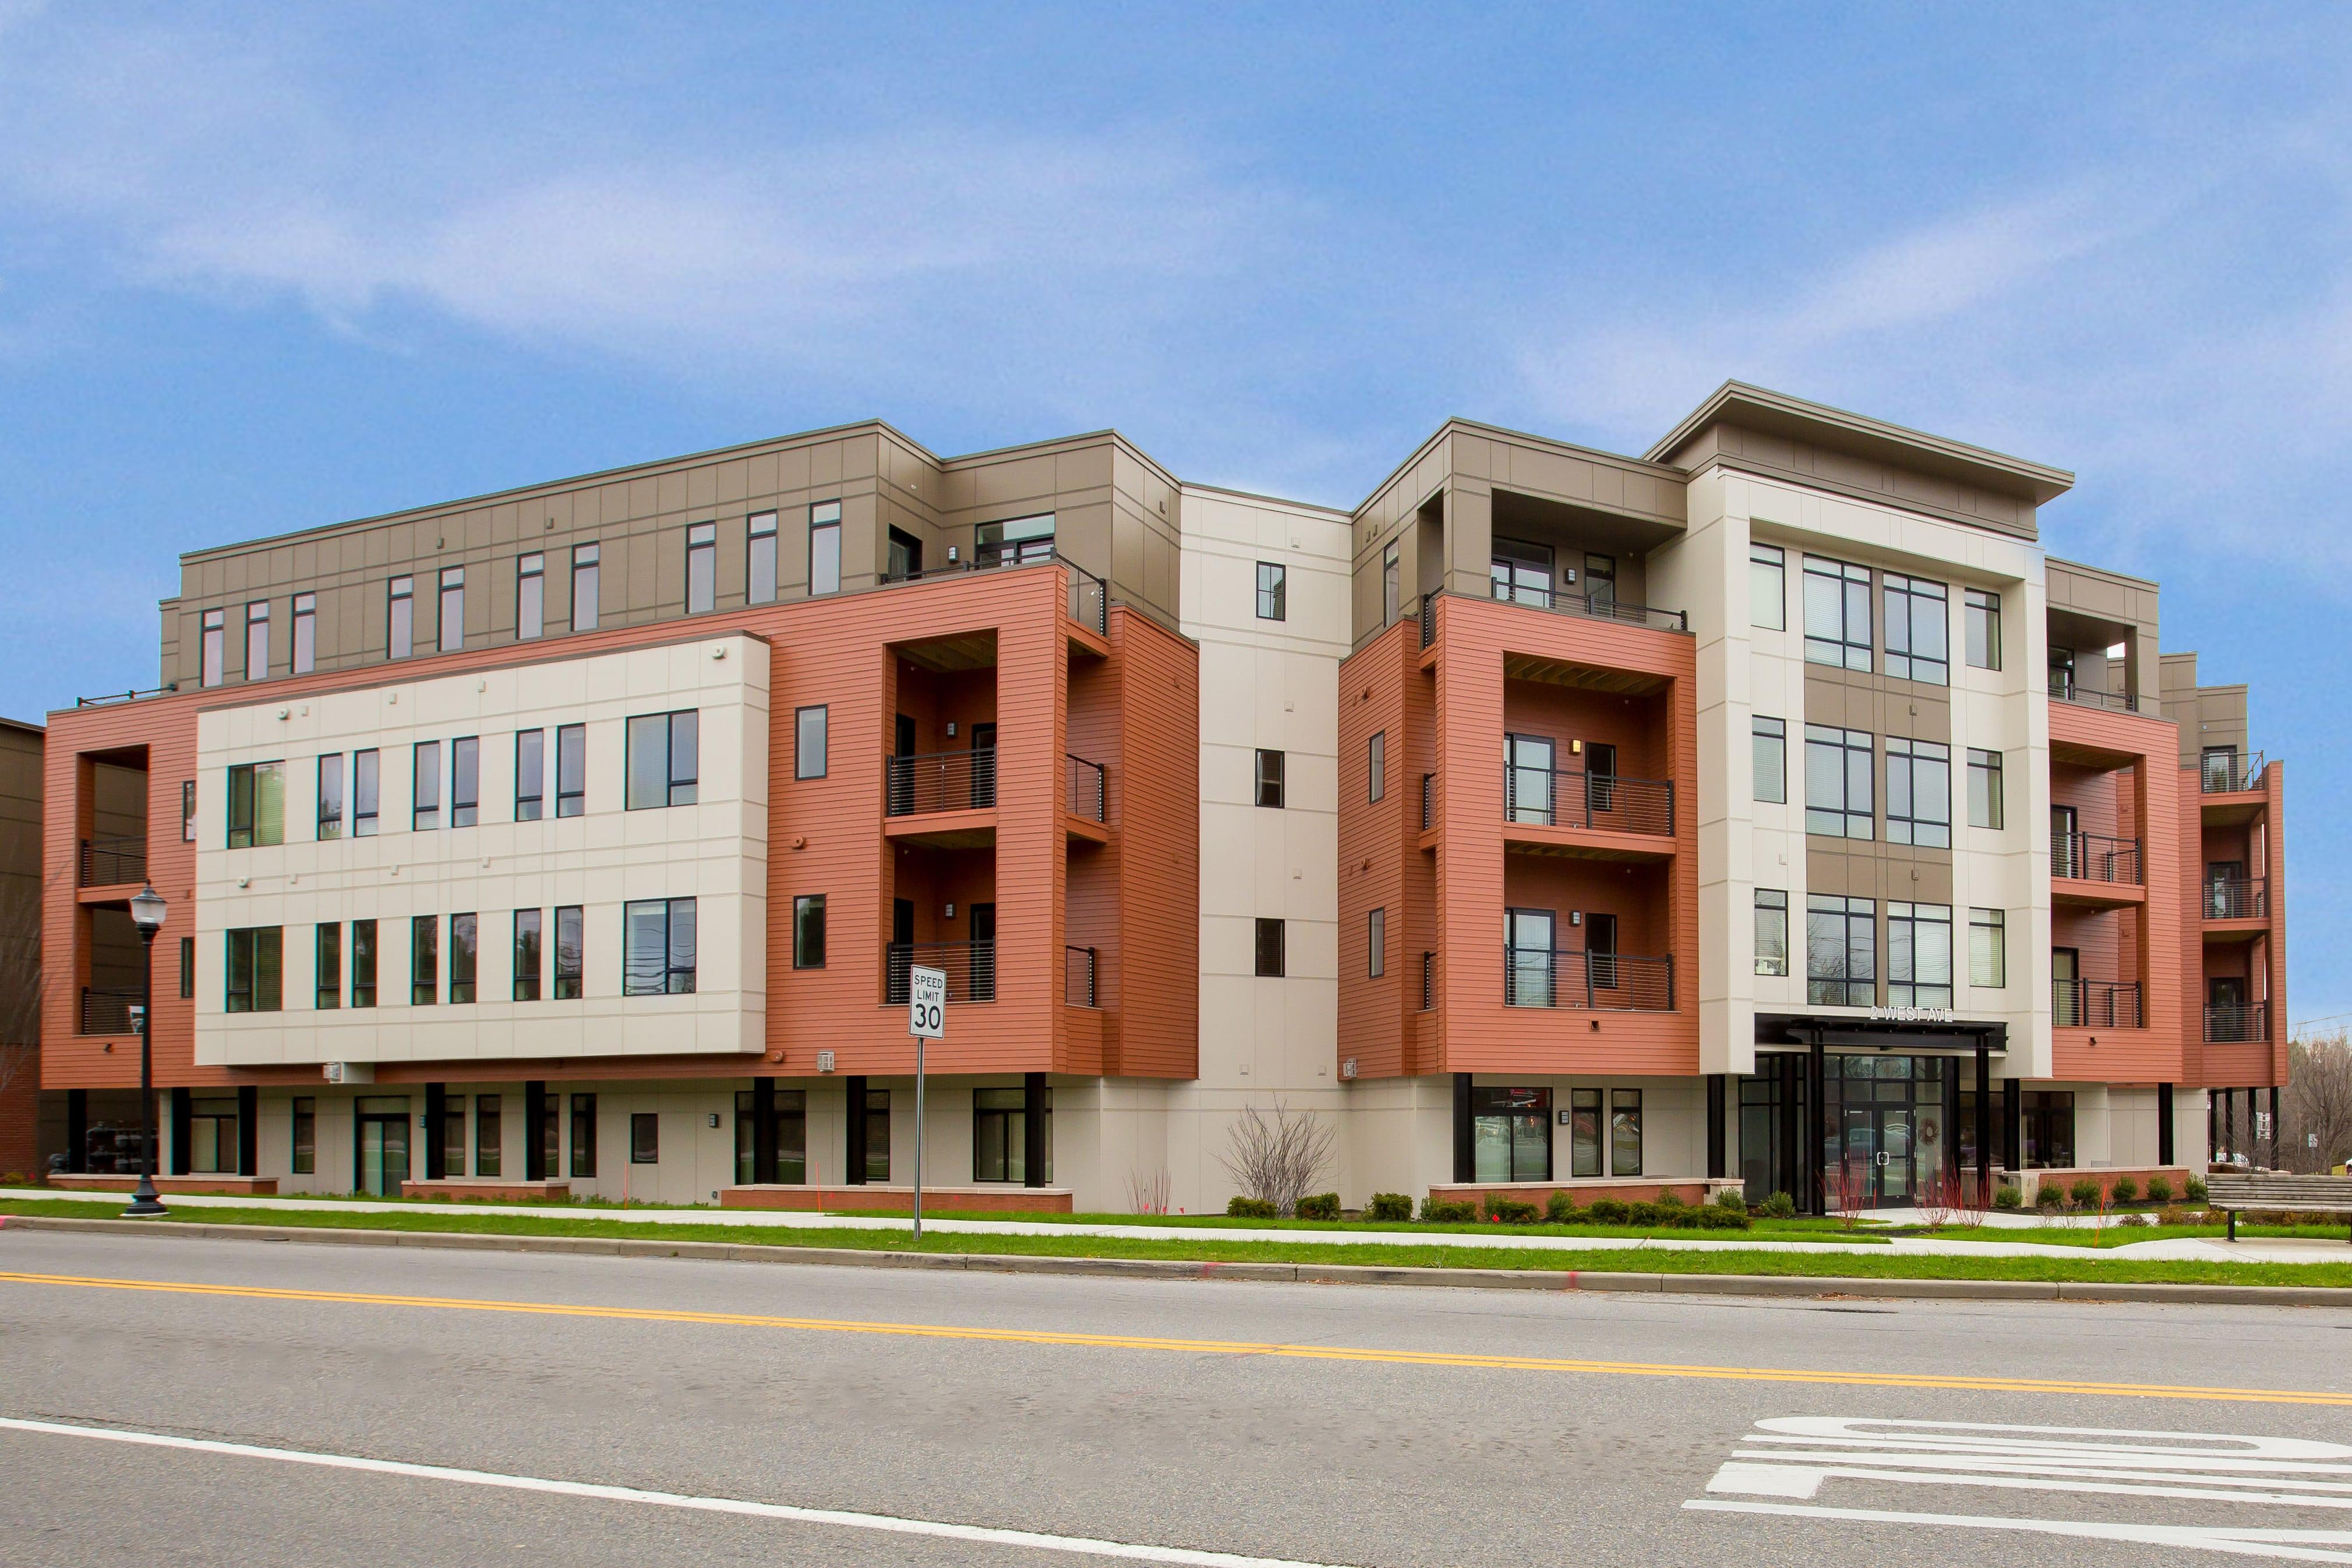 2 West Saratoga - Bonacio Construction